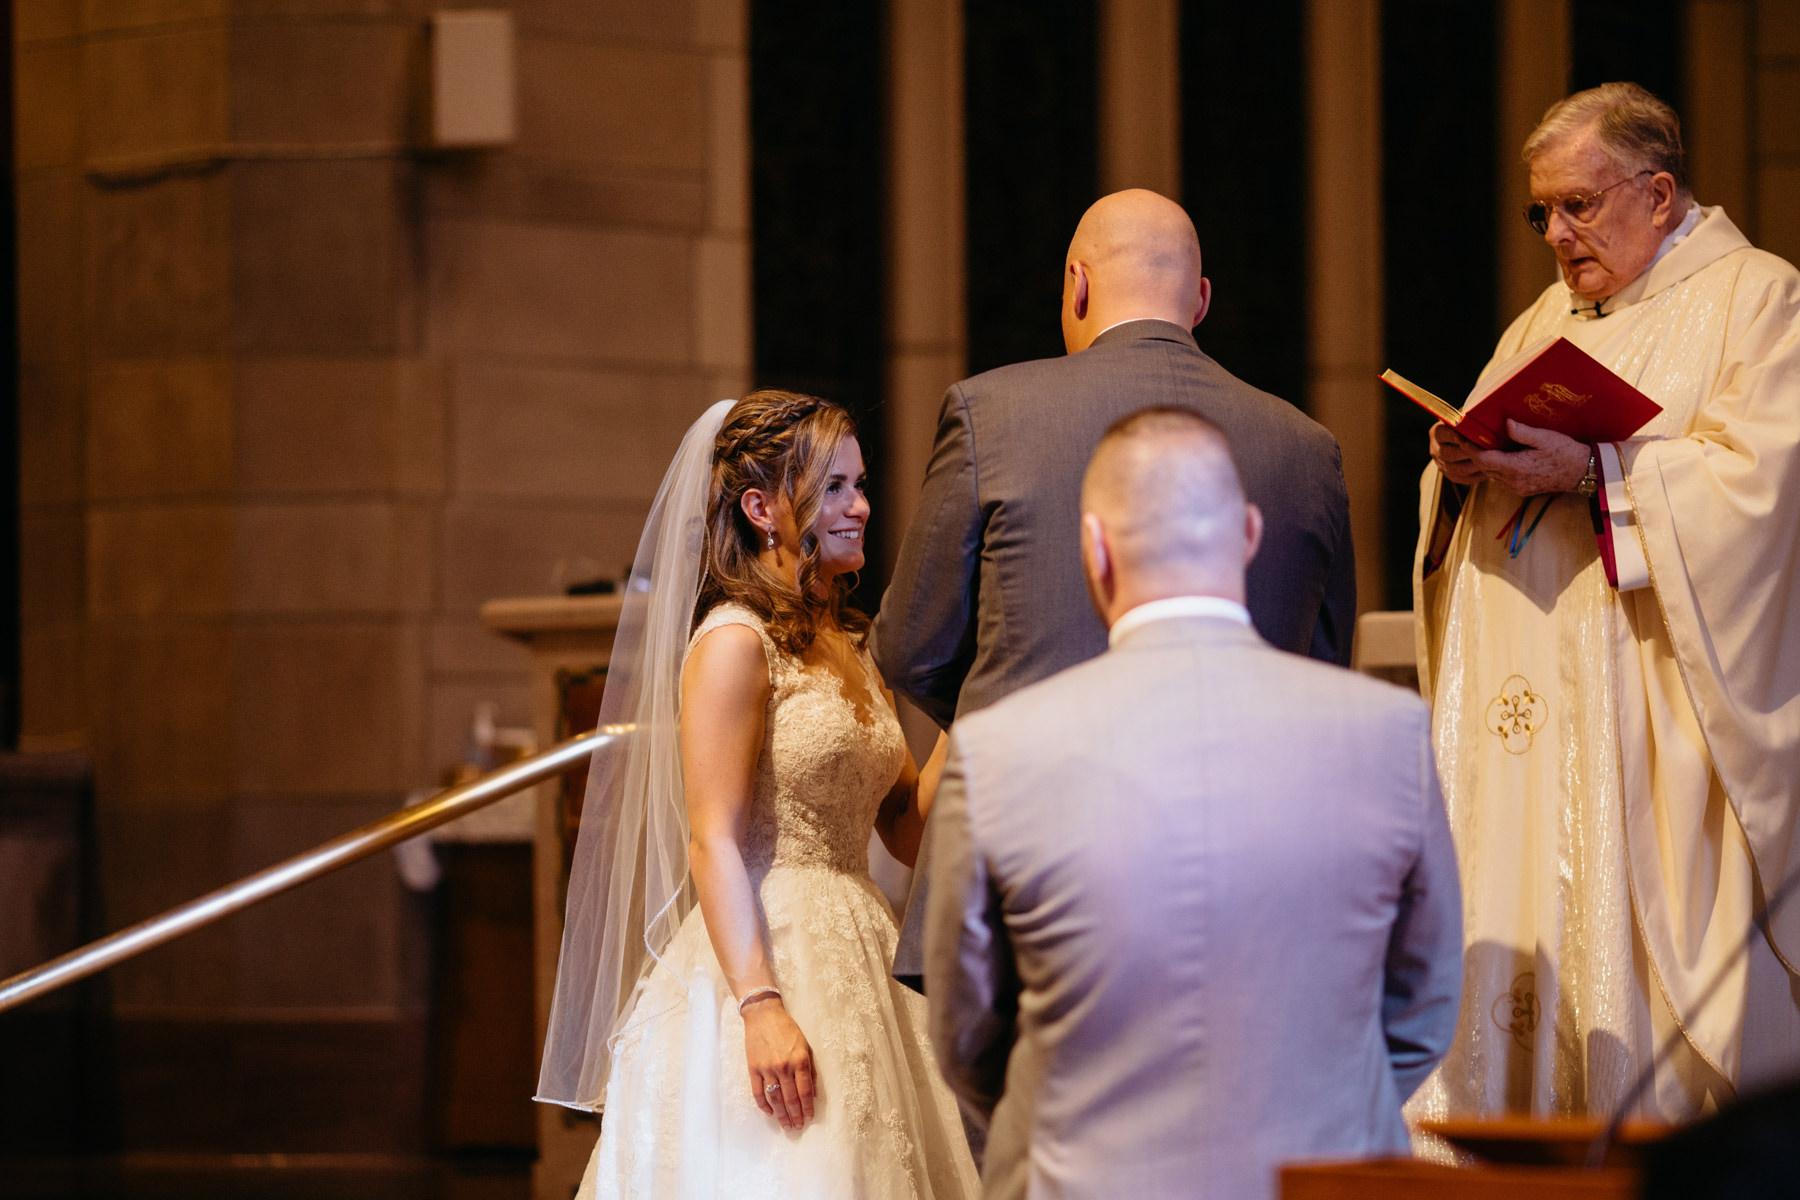 Quincy Ma Massachusetts Wedding Dedham Boston Granie Links Wedding New England Catholic Cathedral Liz Osban Photography 50.jpg